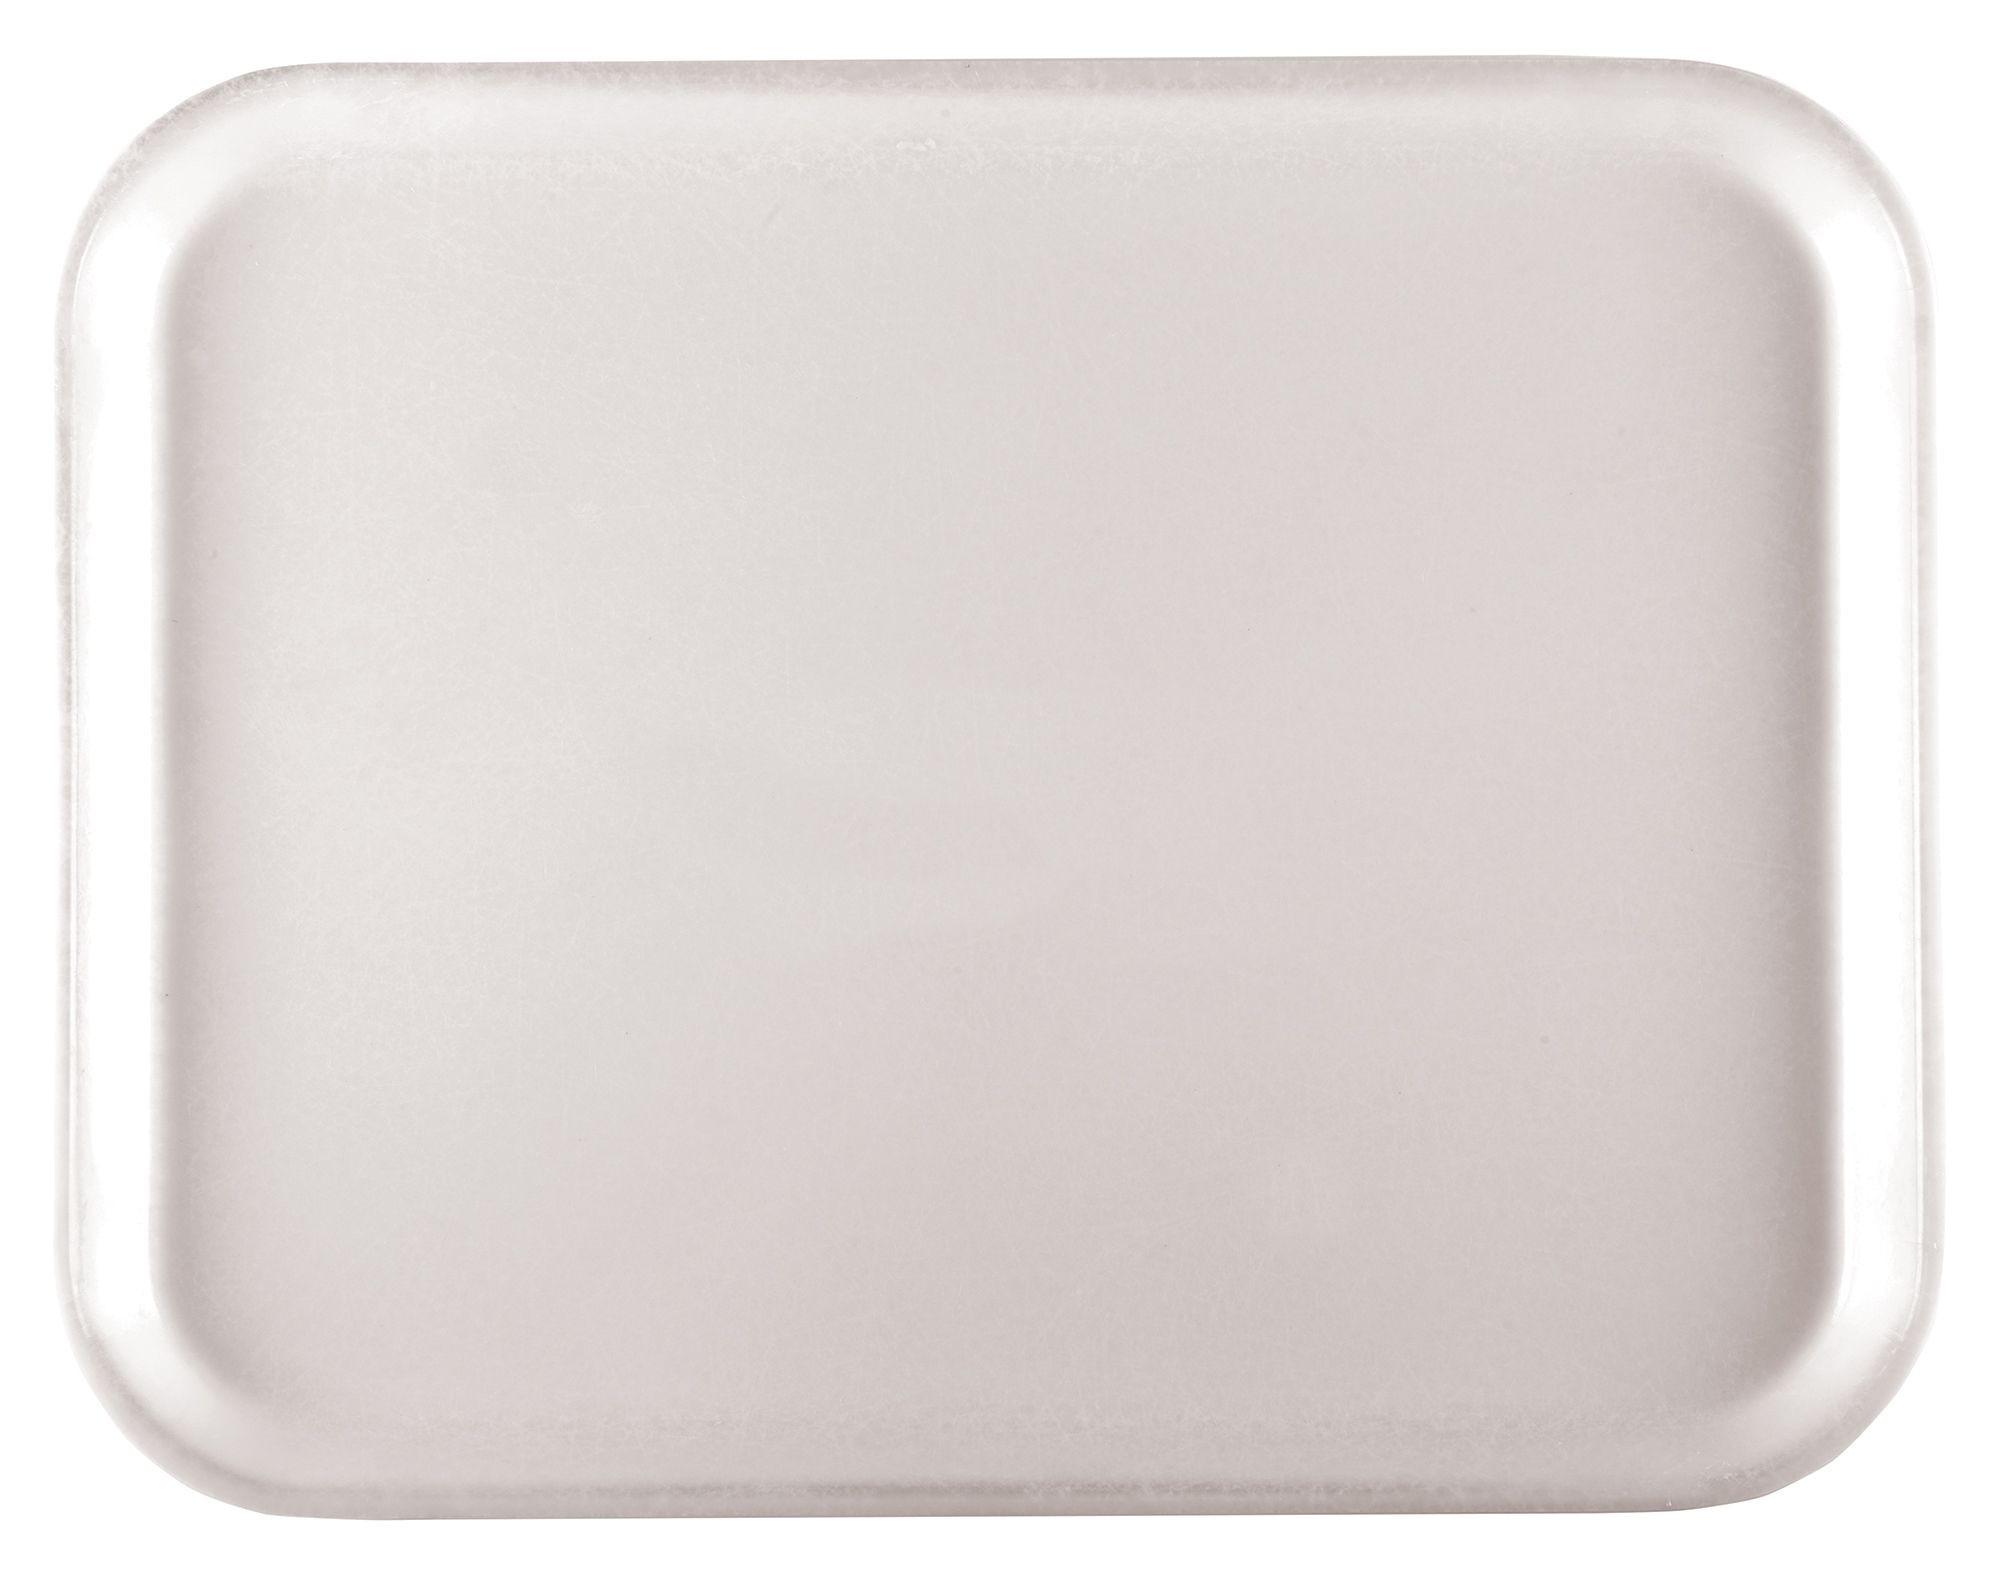 Winco FGT-1520W Fiberglass Rectangular Tray, White, 15quot; x 20quot;